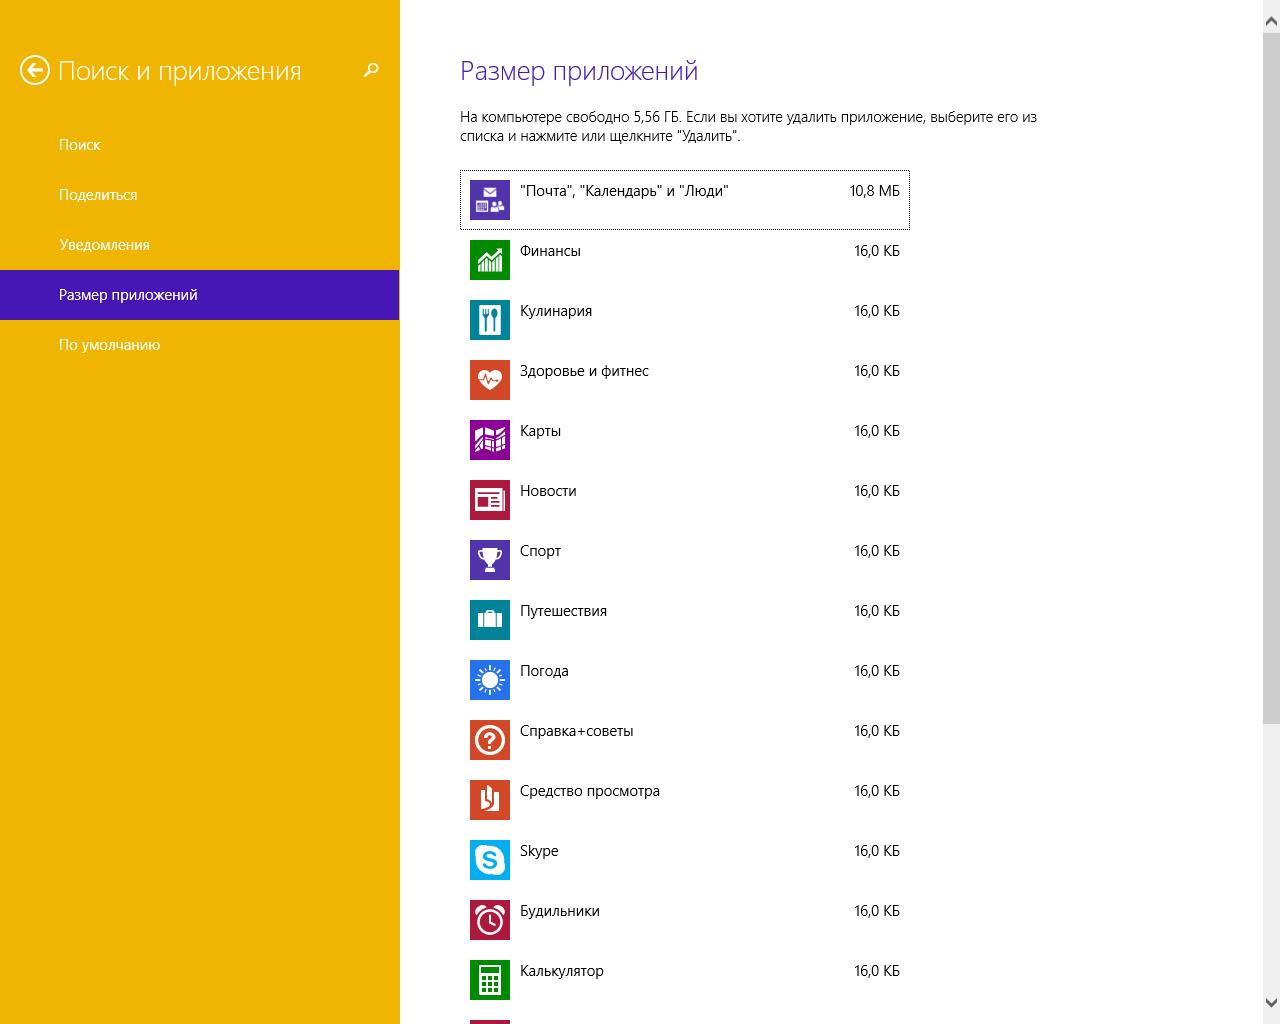 Размер приложений Windows 8.1